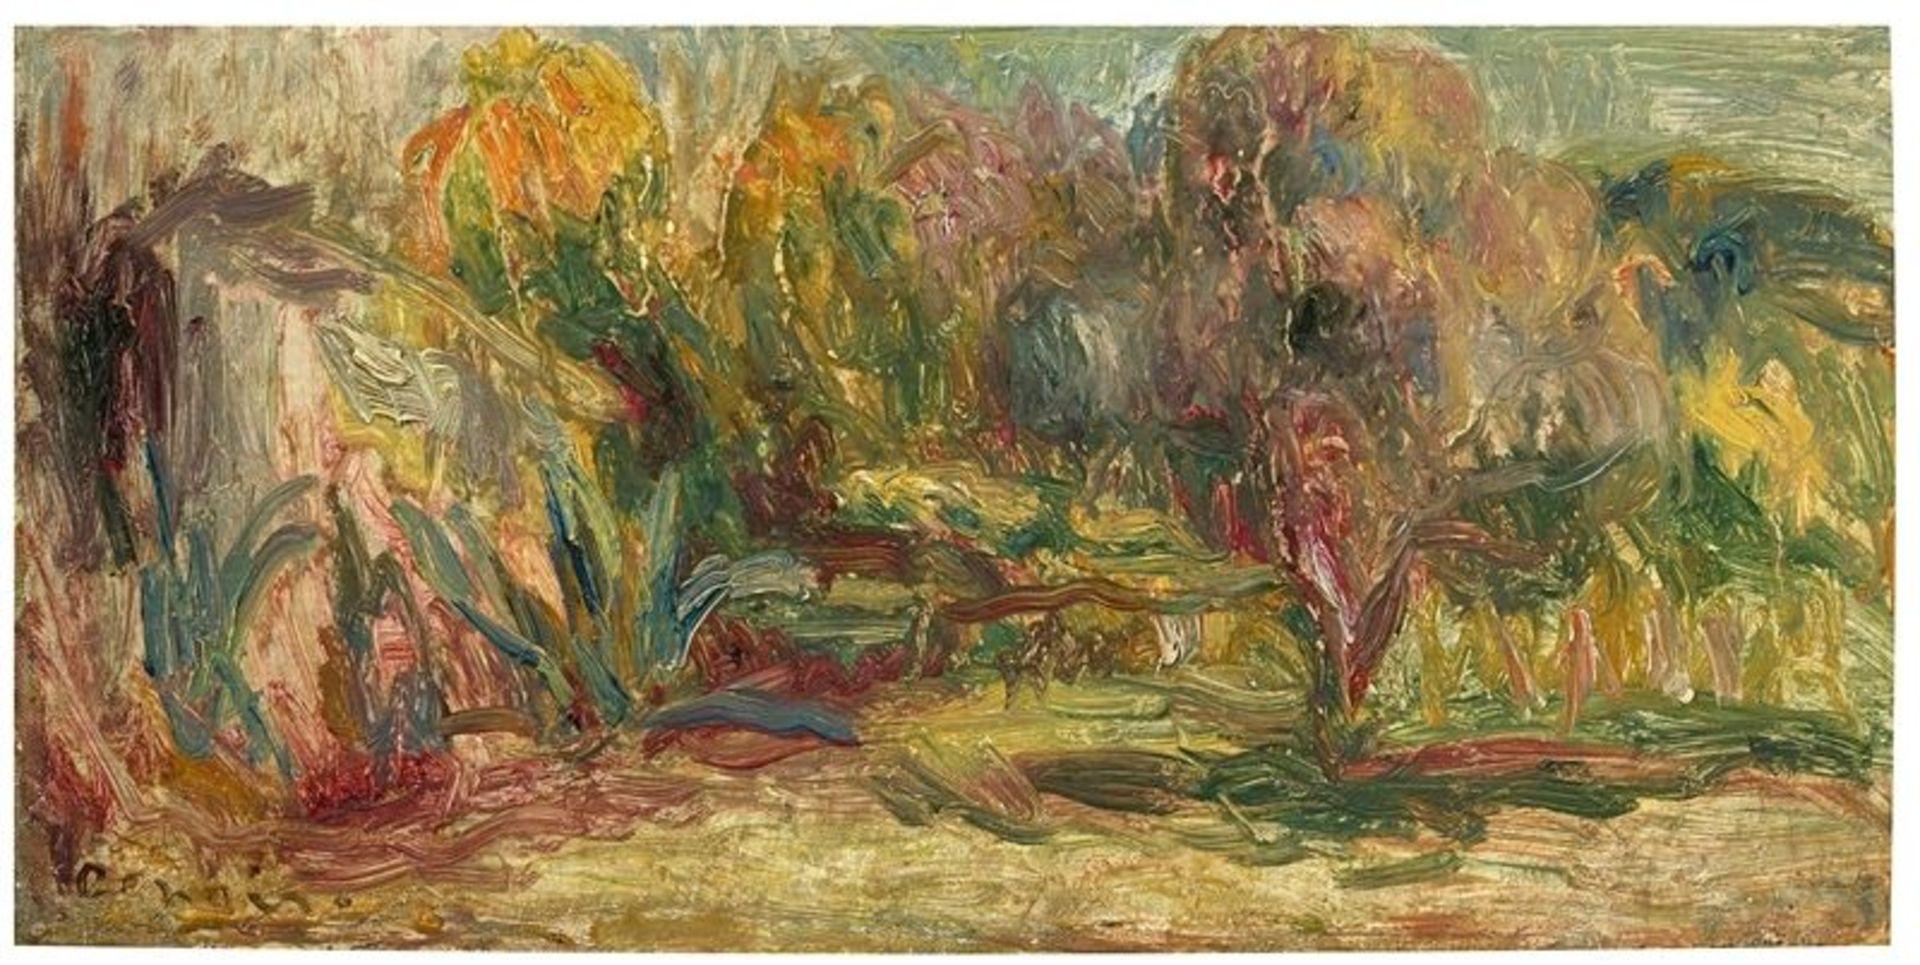 Los 128 - Auguste Renoir (Limoges 1841 – 1919 Cagnes-sur-Mer)